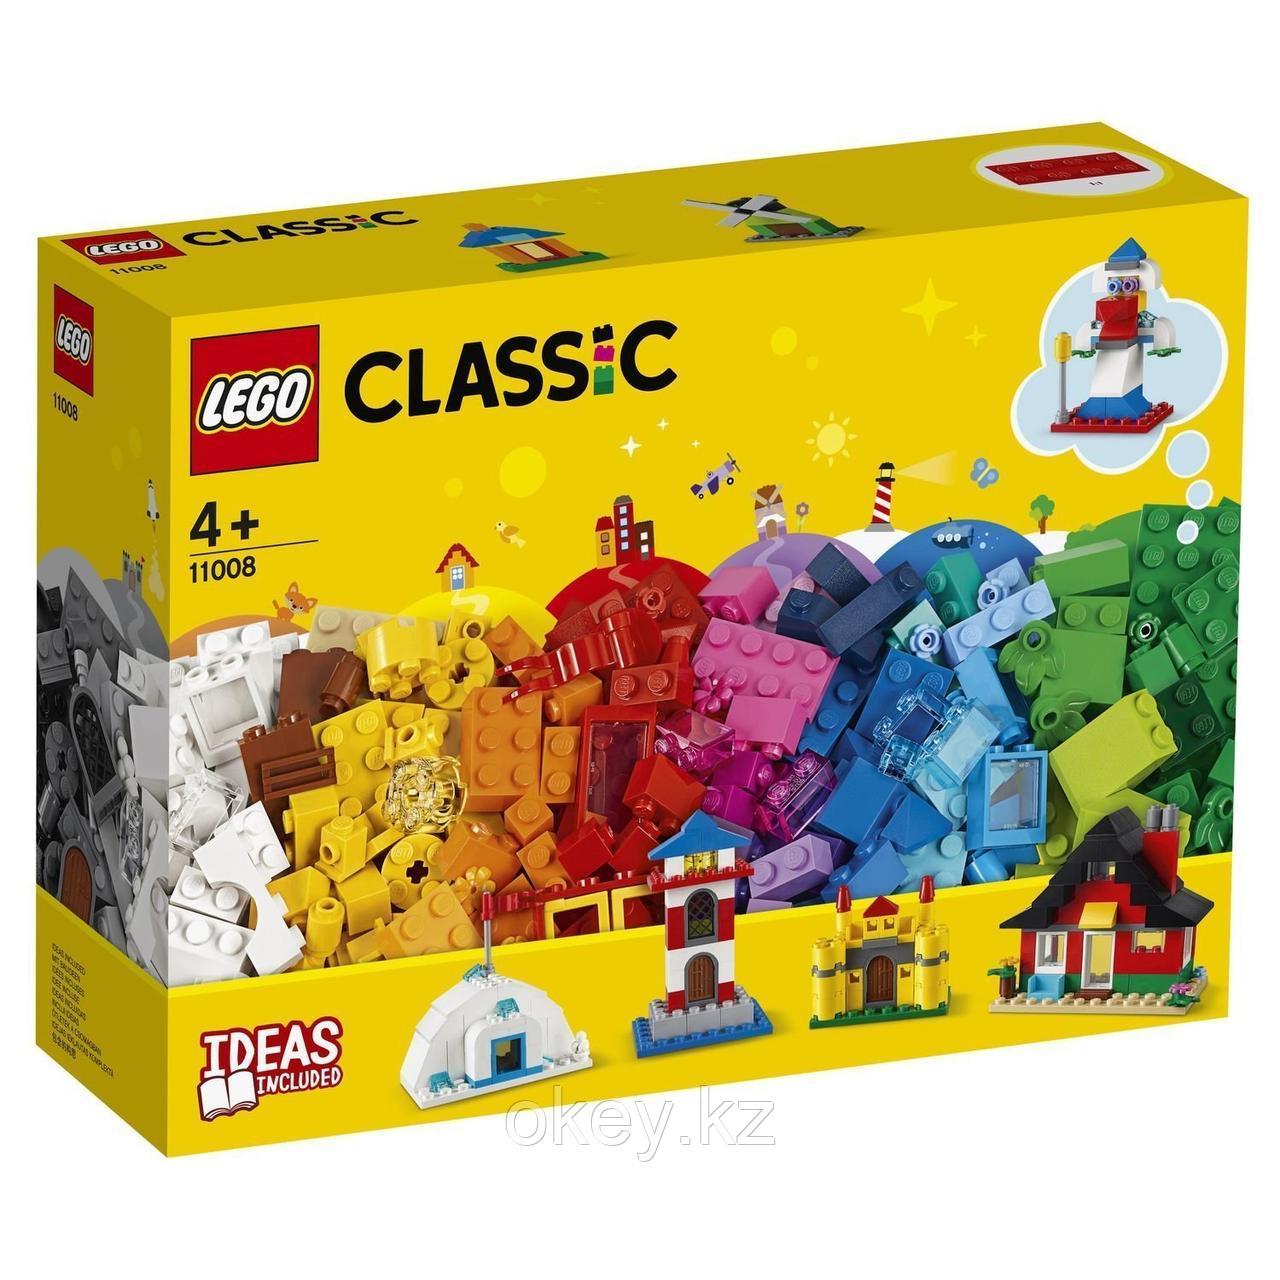 LEGO Classic: Кубики и домики 11008